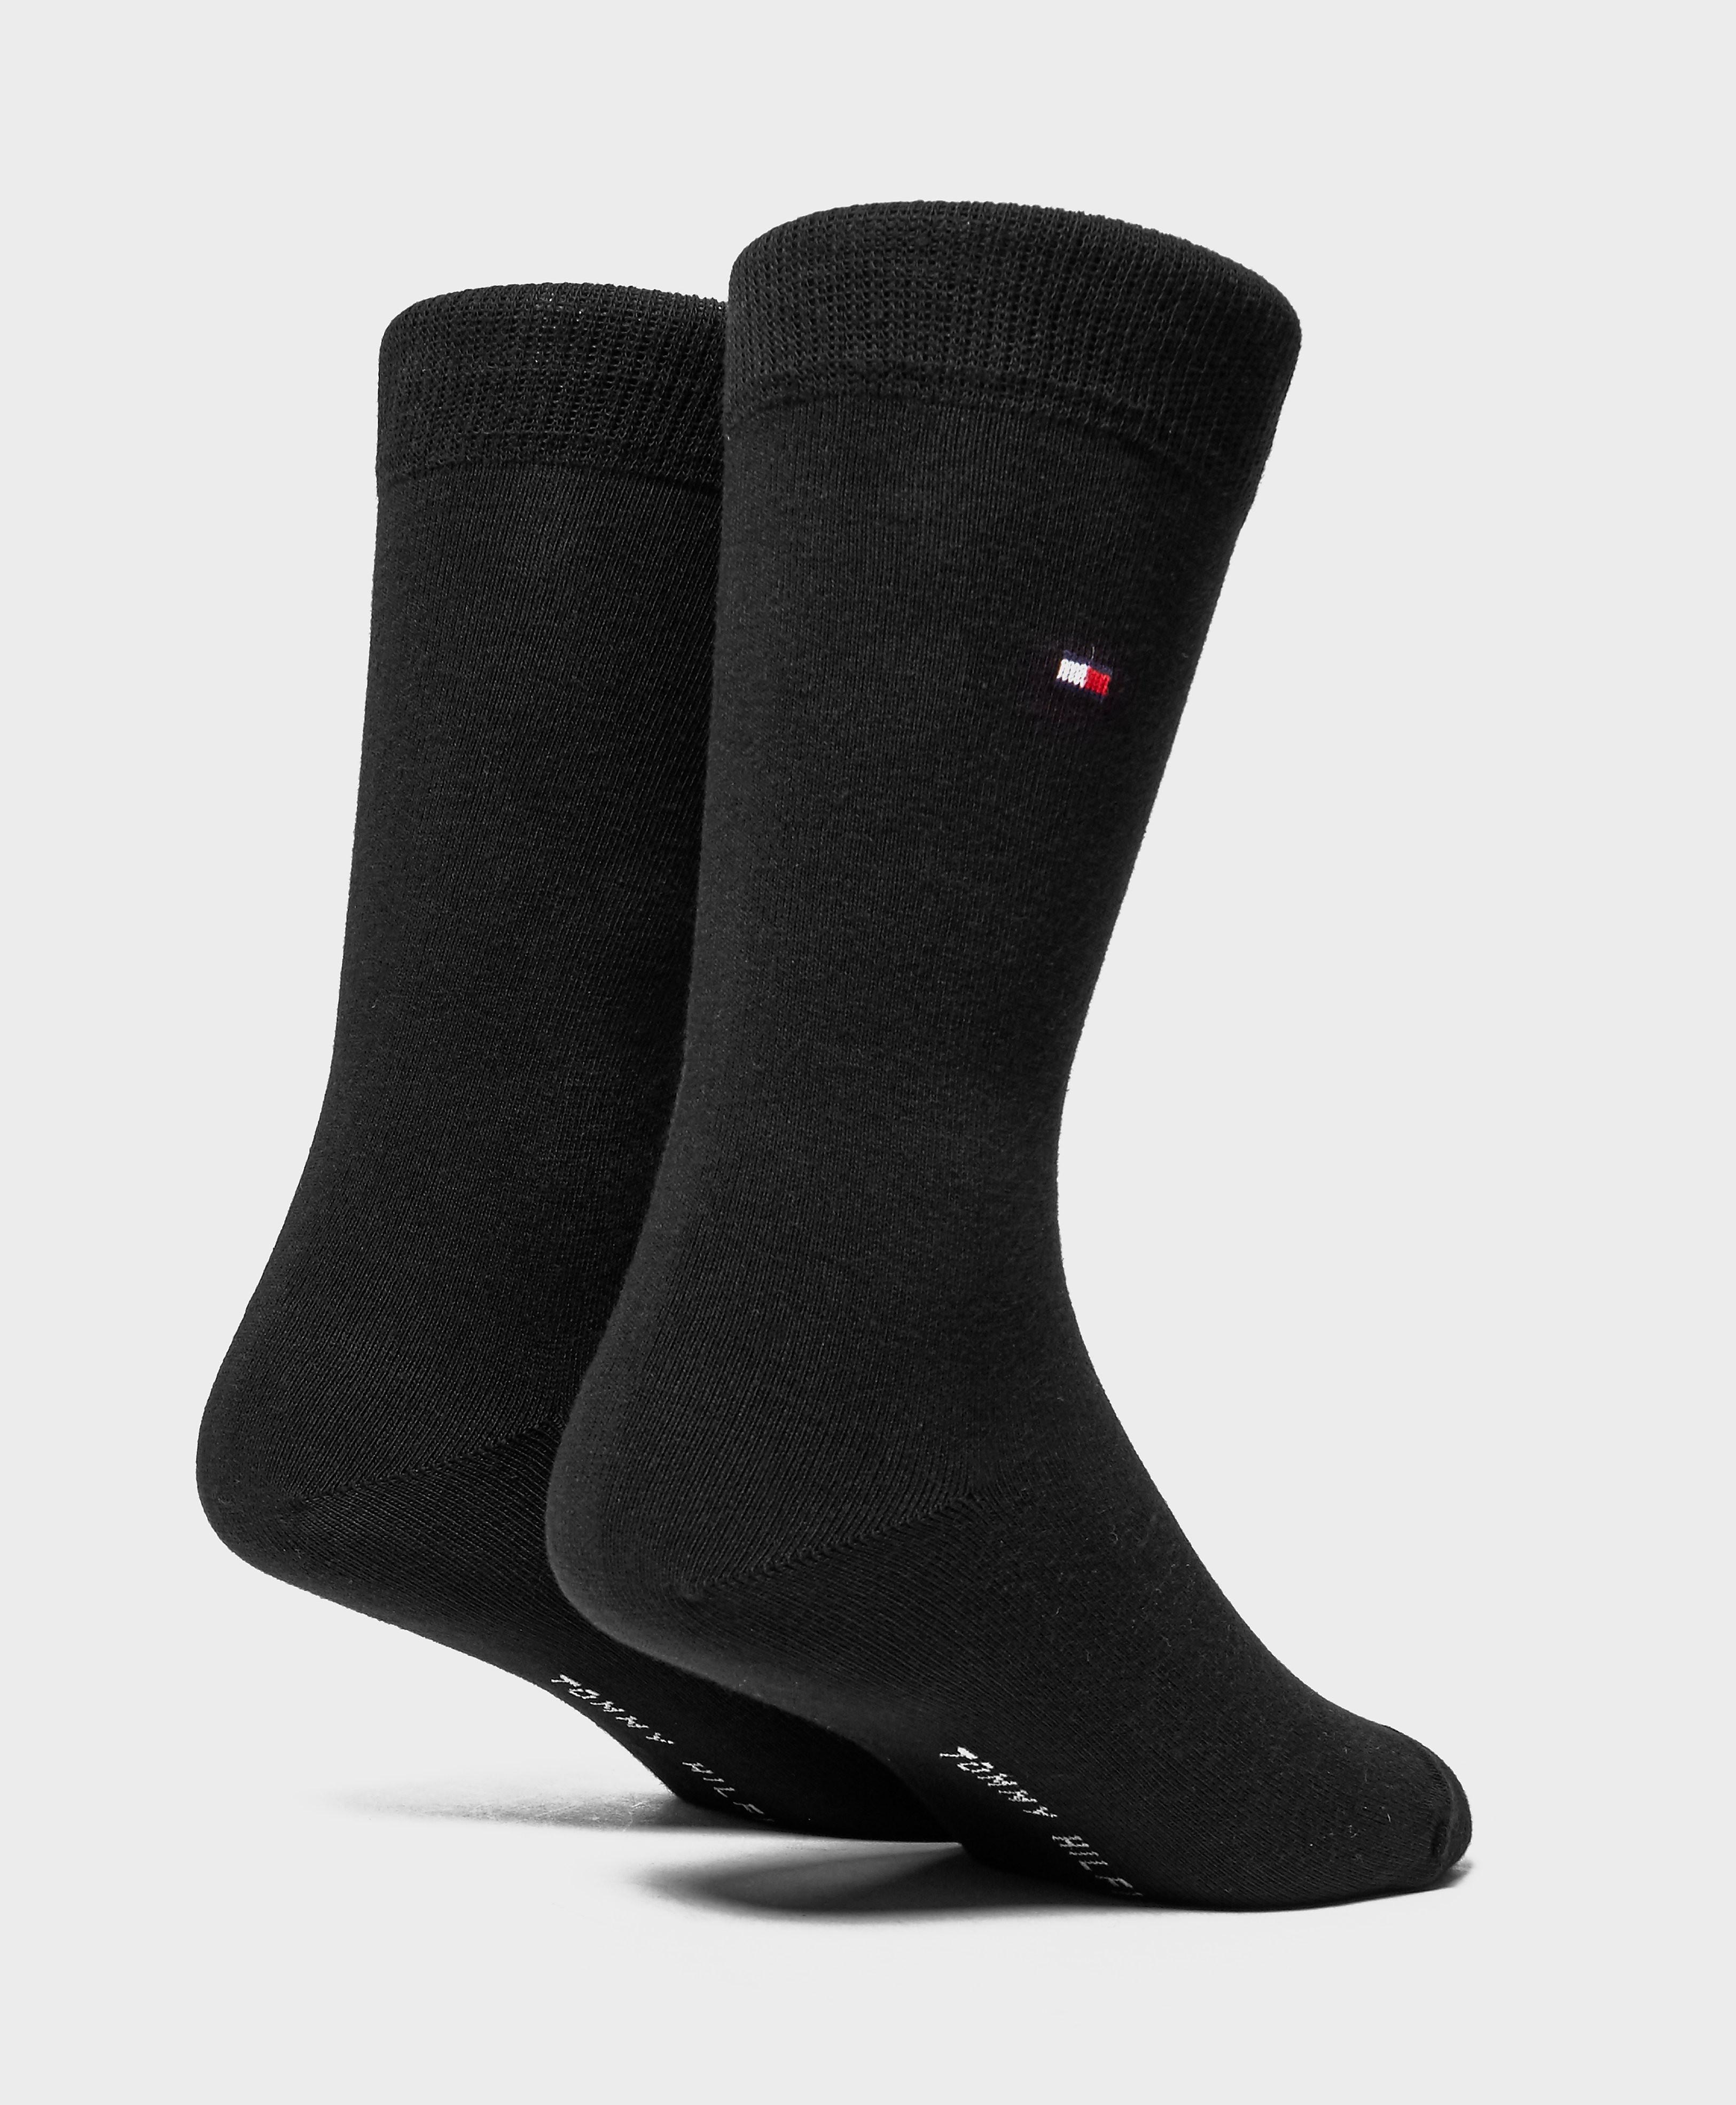 Tommy Hilfiger 2-Pack Classic Socks